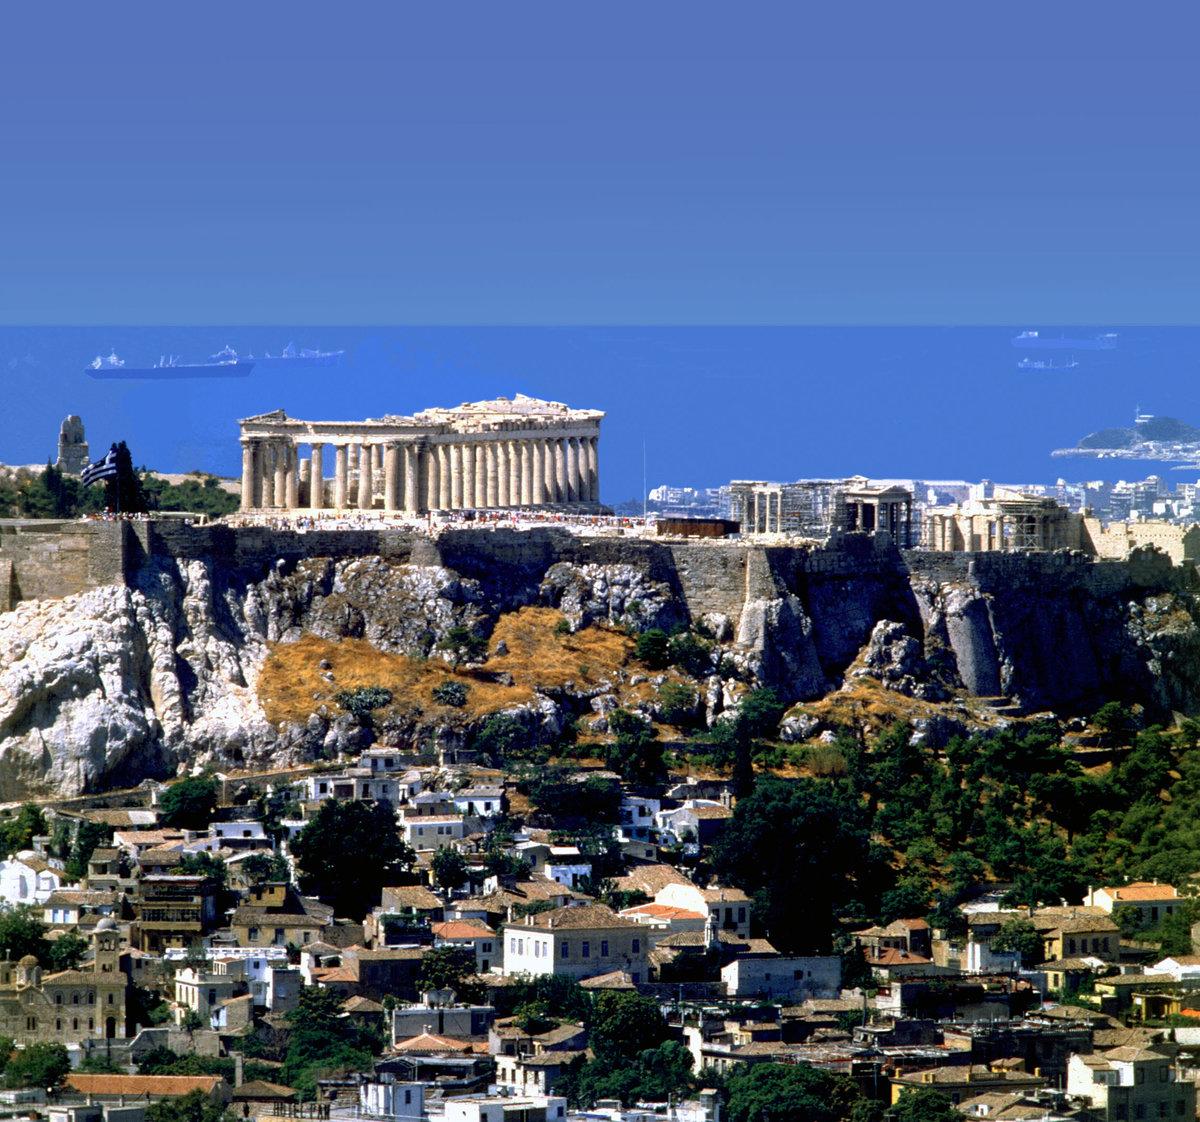 греческий город картинки